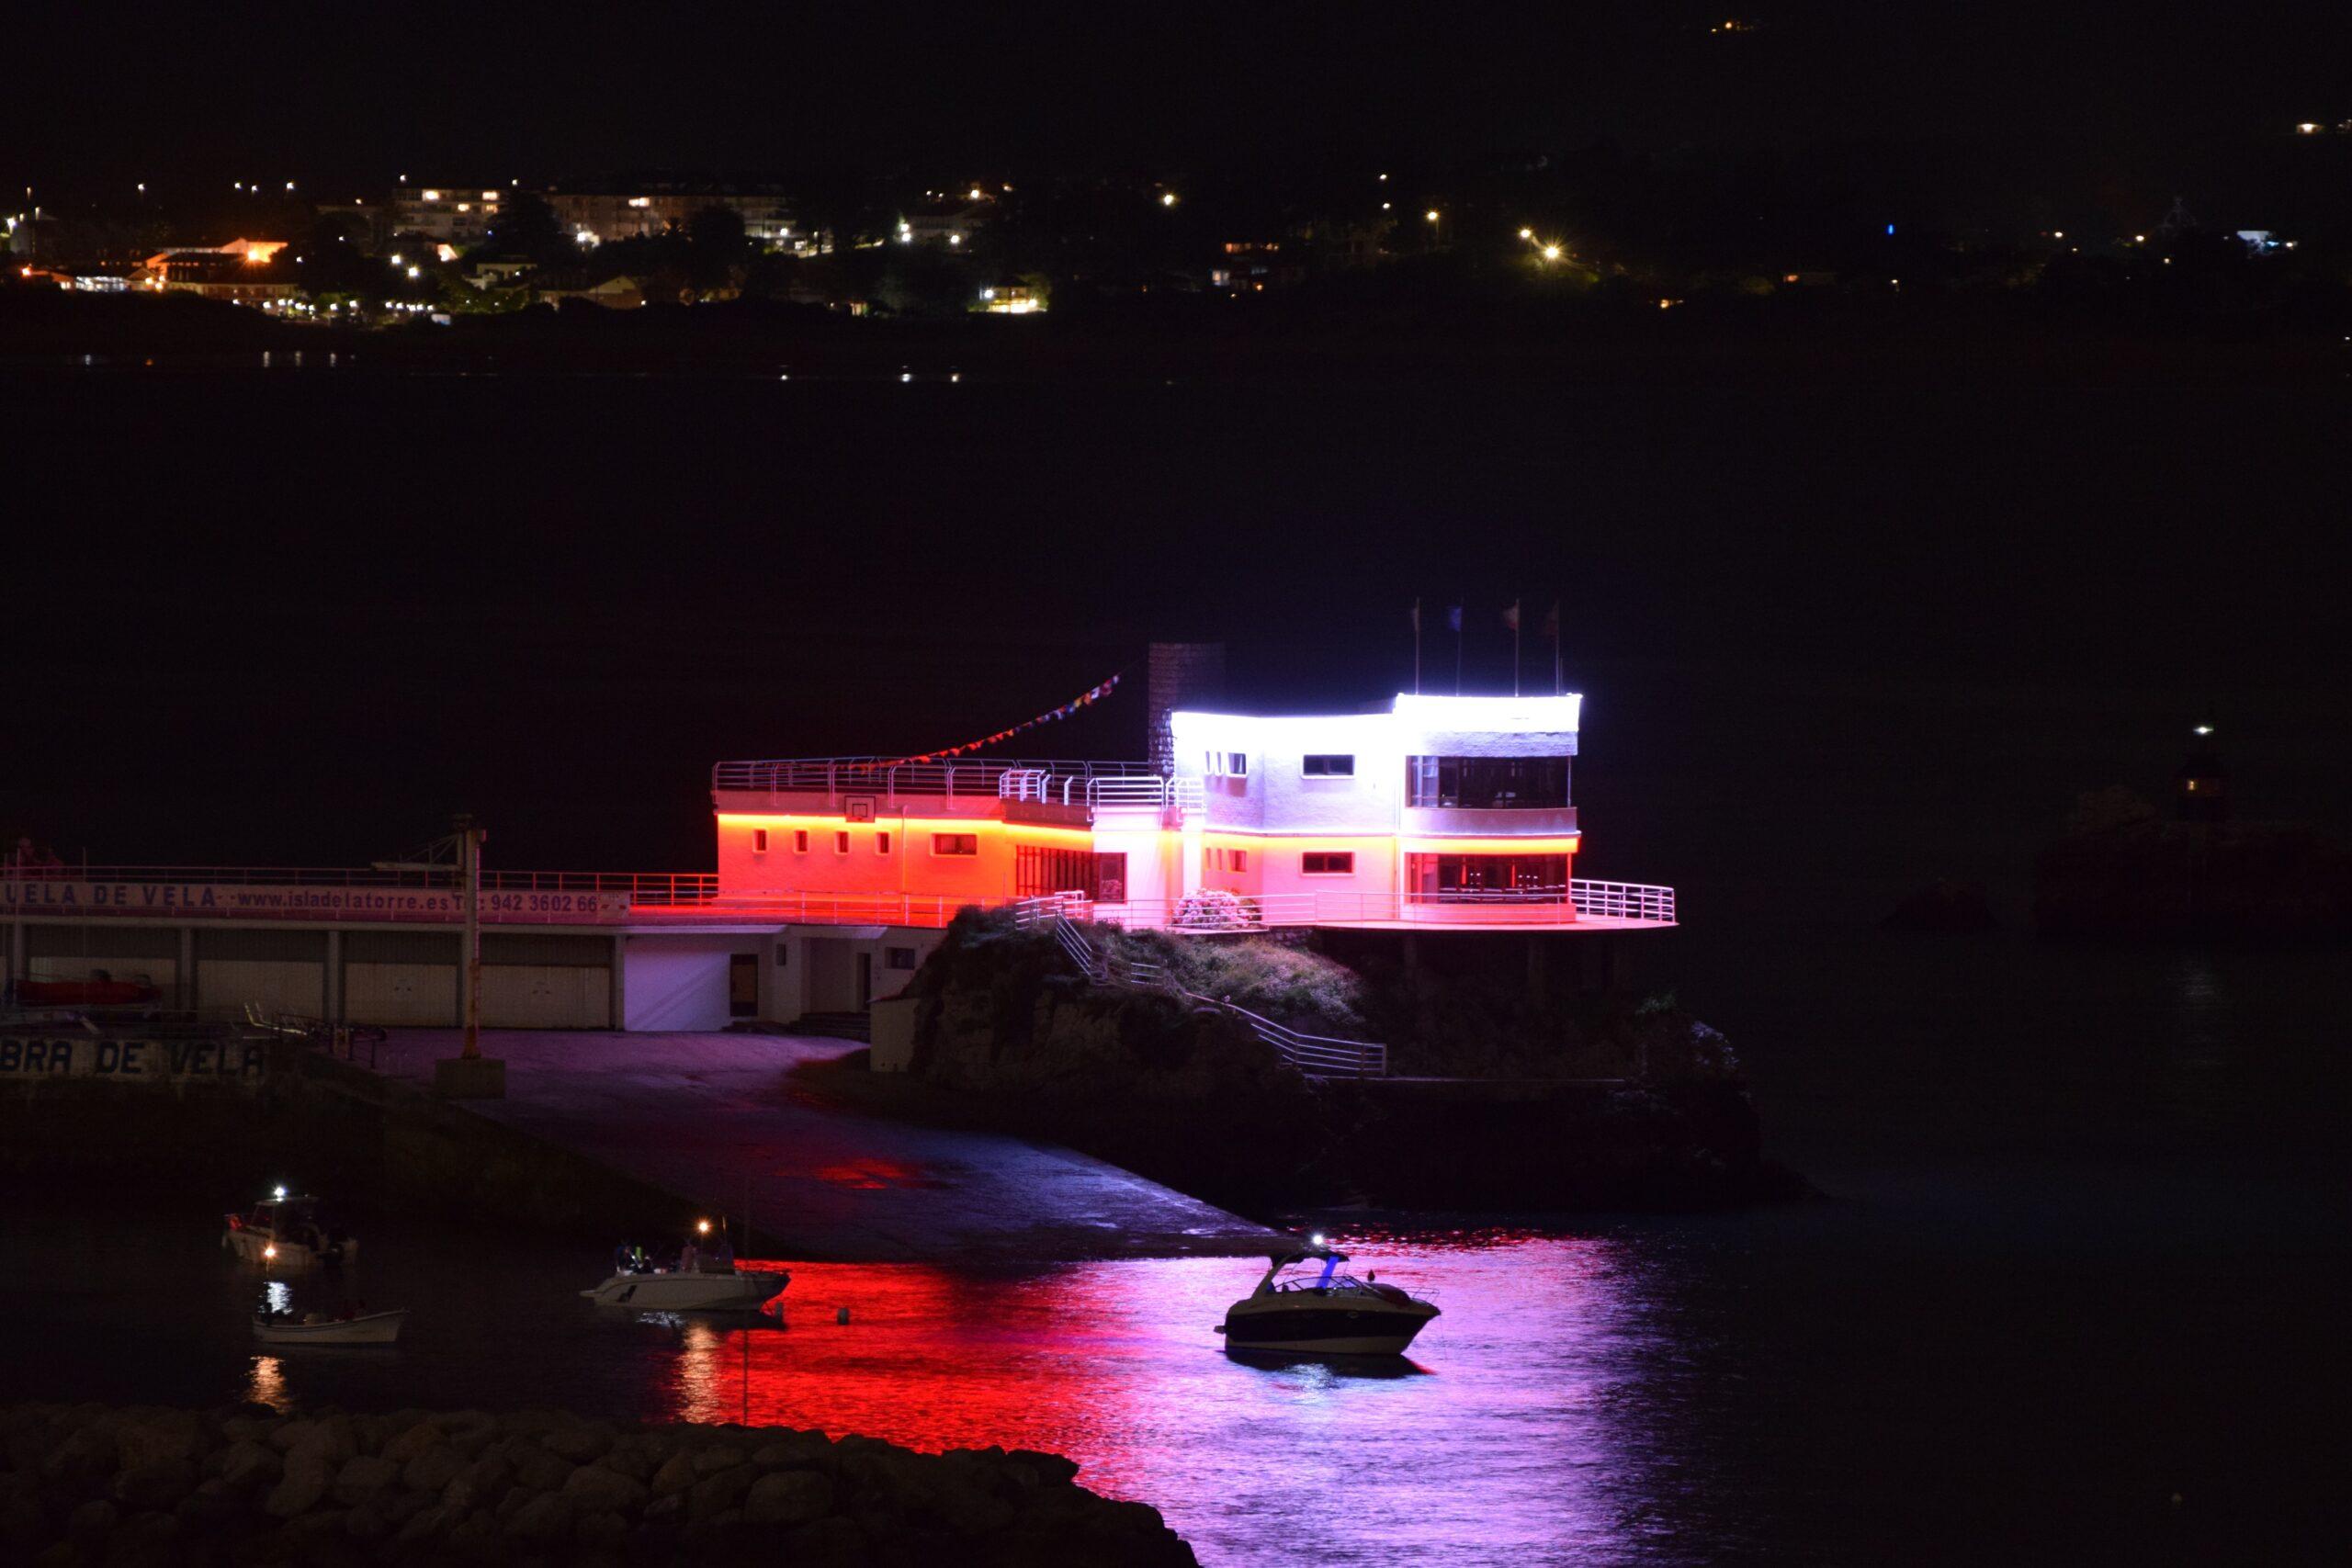 La Autoridad Portuaria de Santander ilumina la Isla de Torre